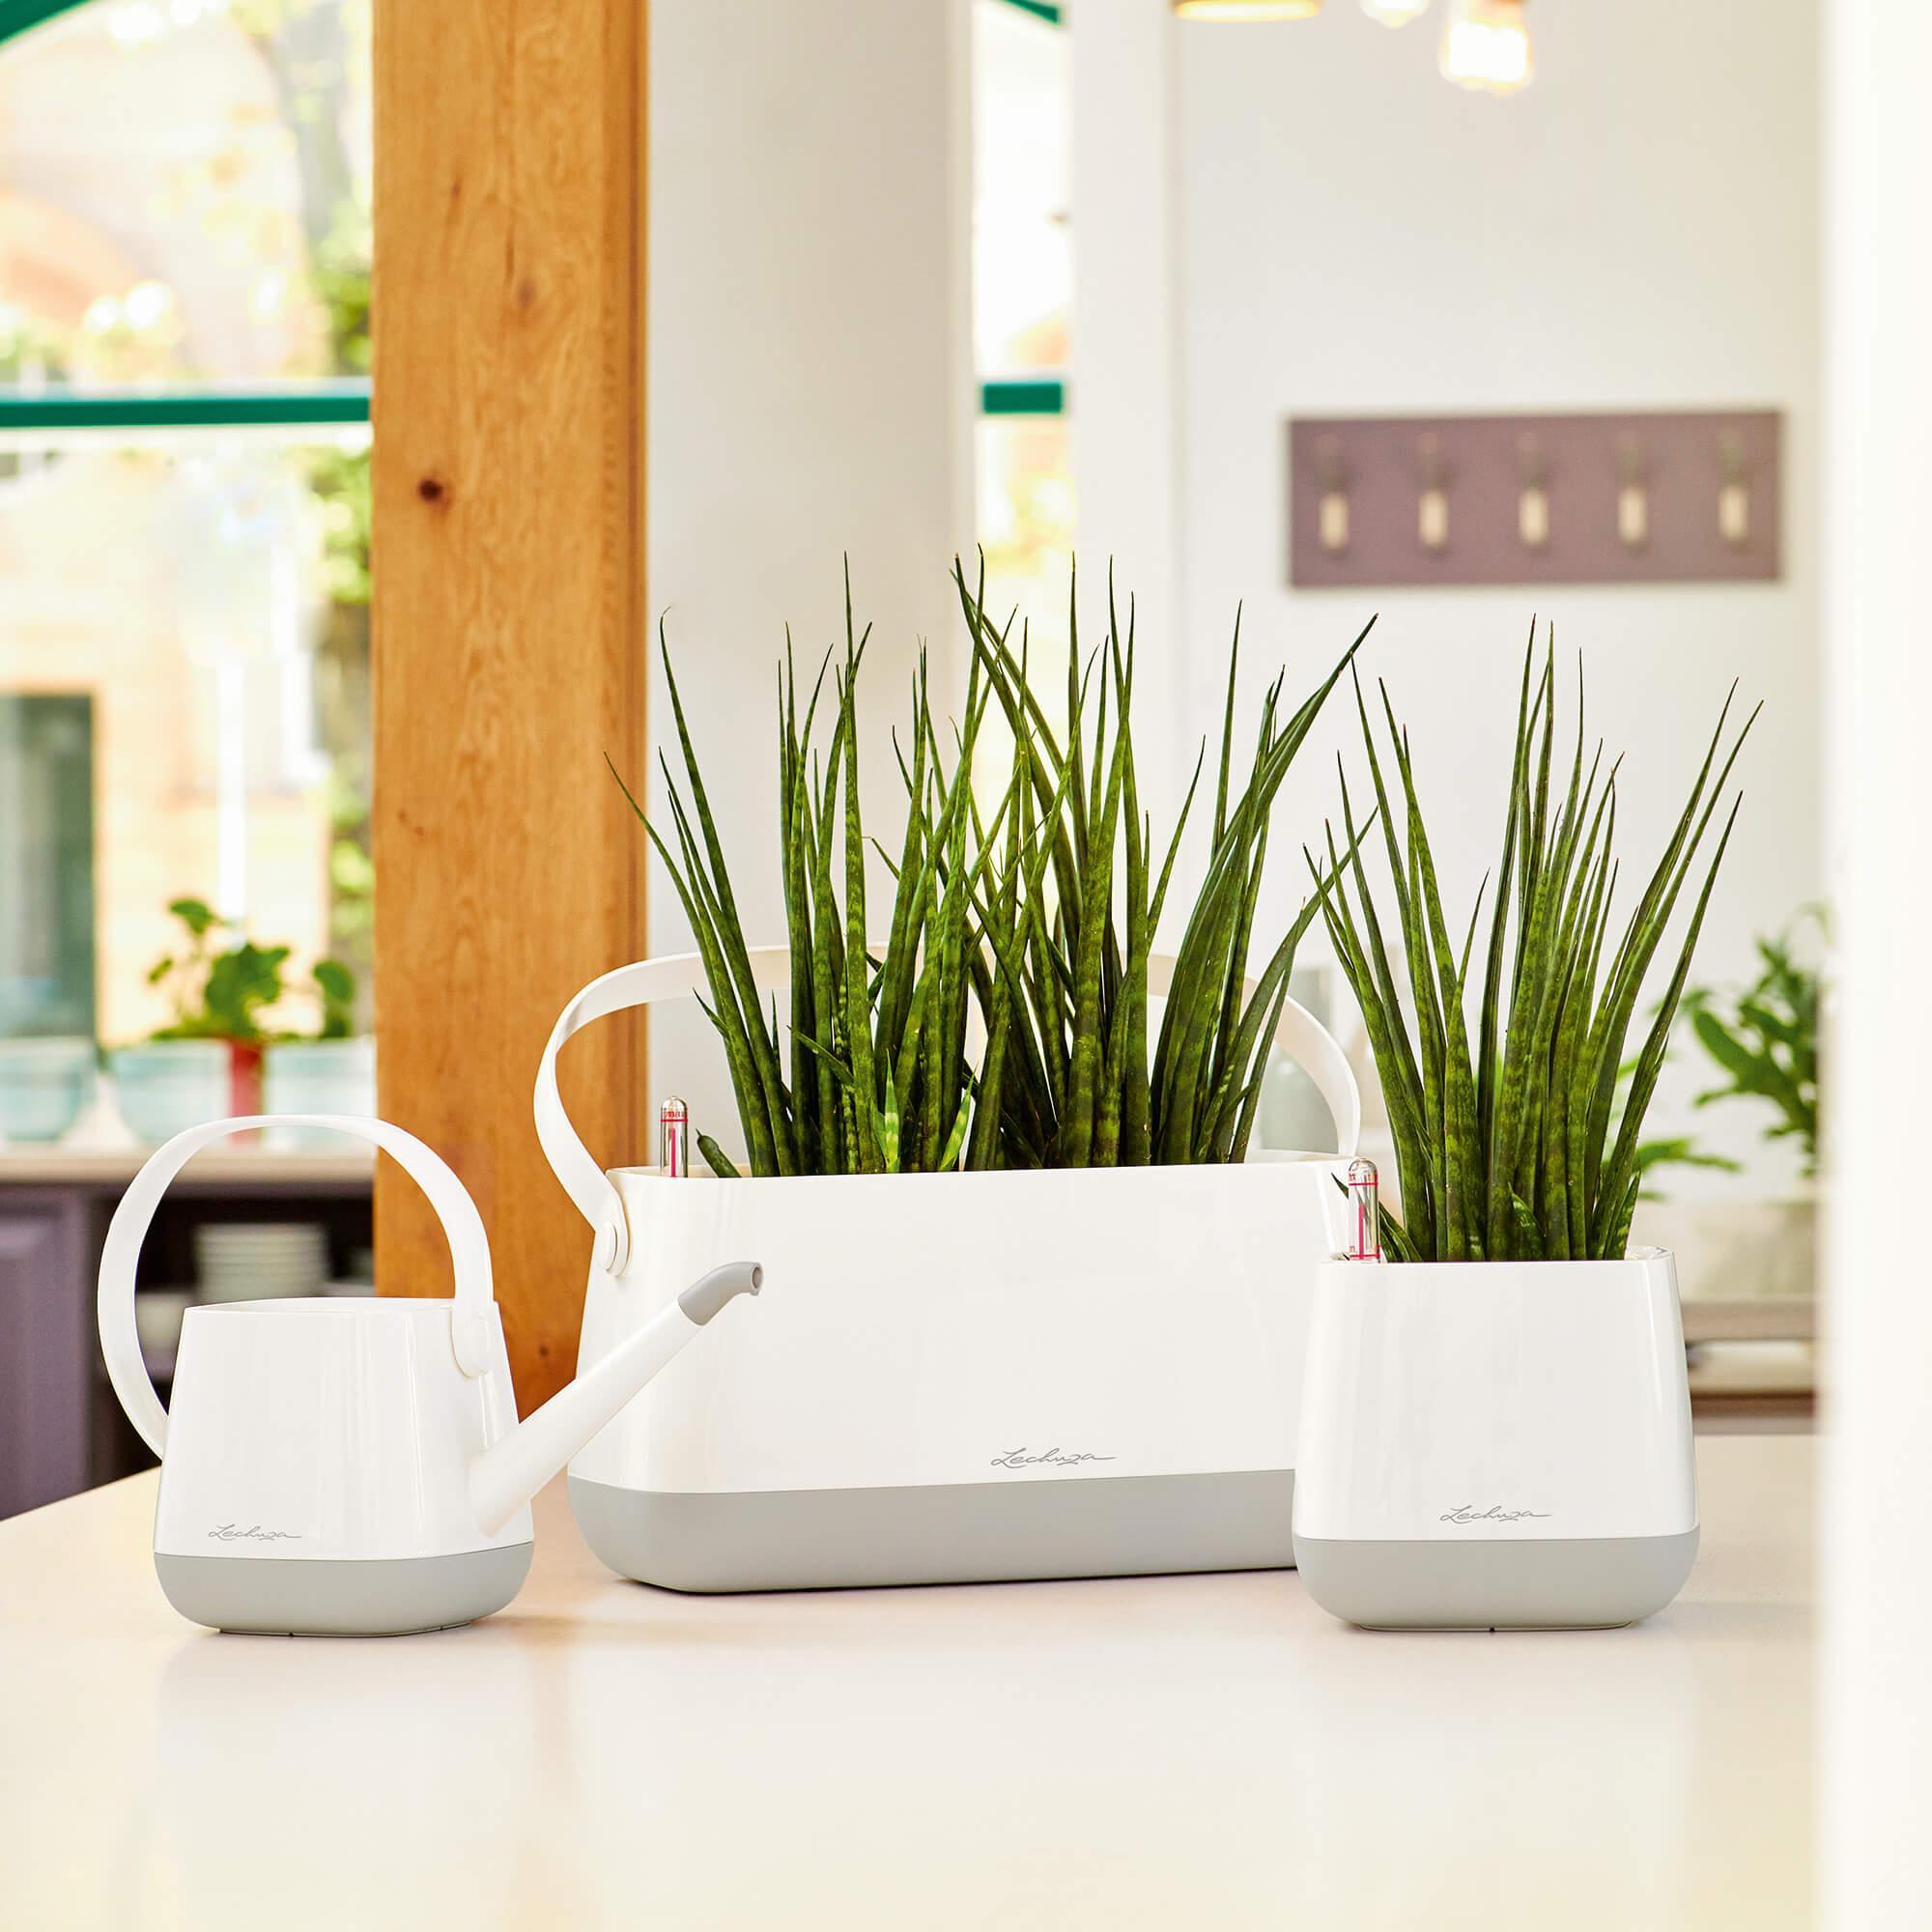 YULA plant bag white/gray semi-gloss - Image 7